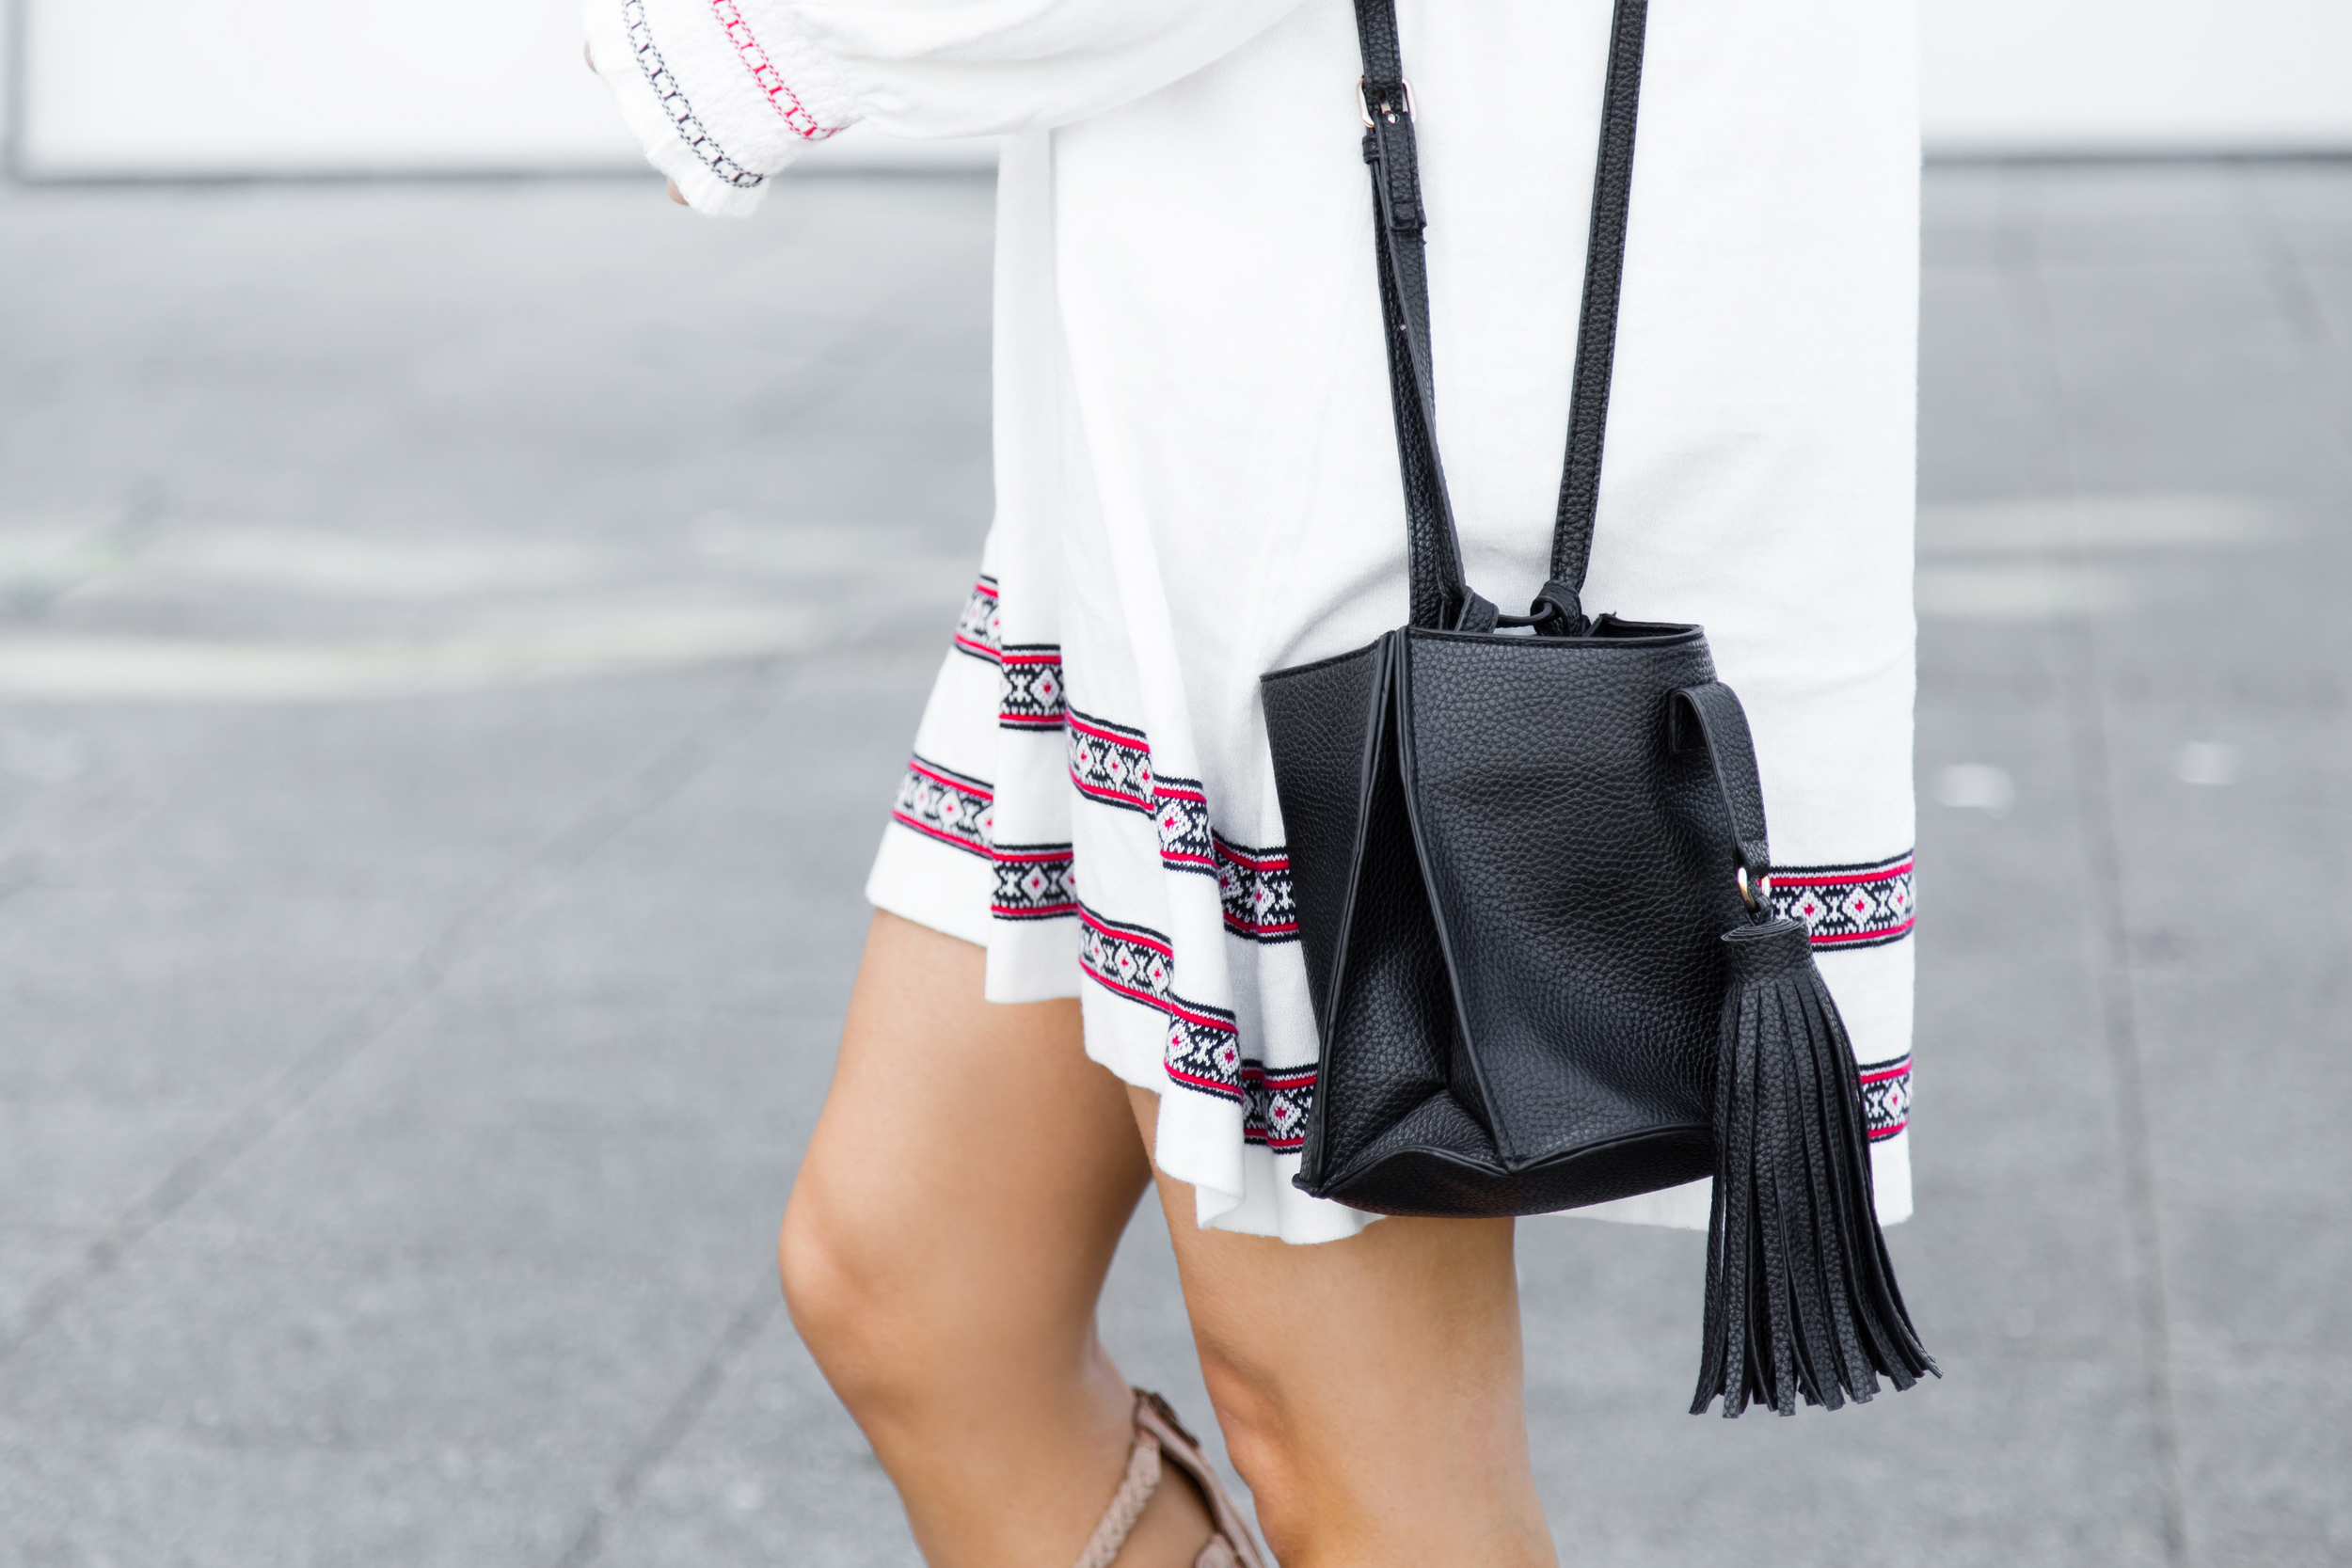 Summer fashion staples